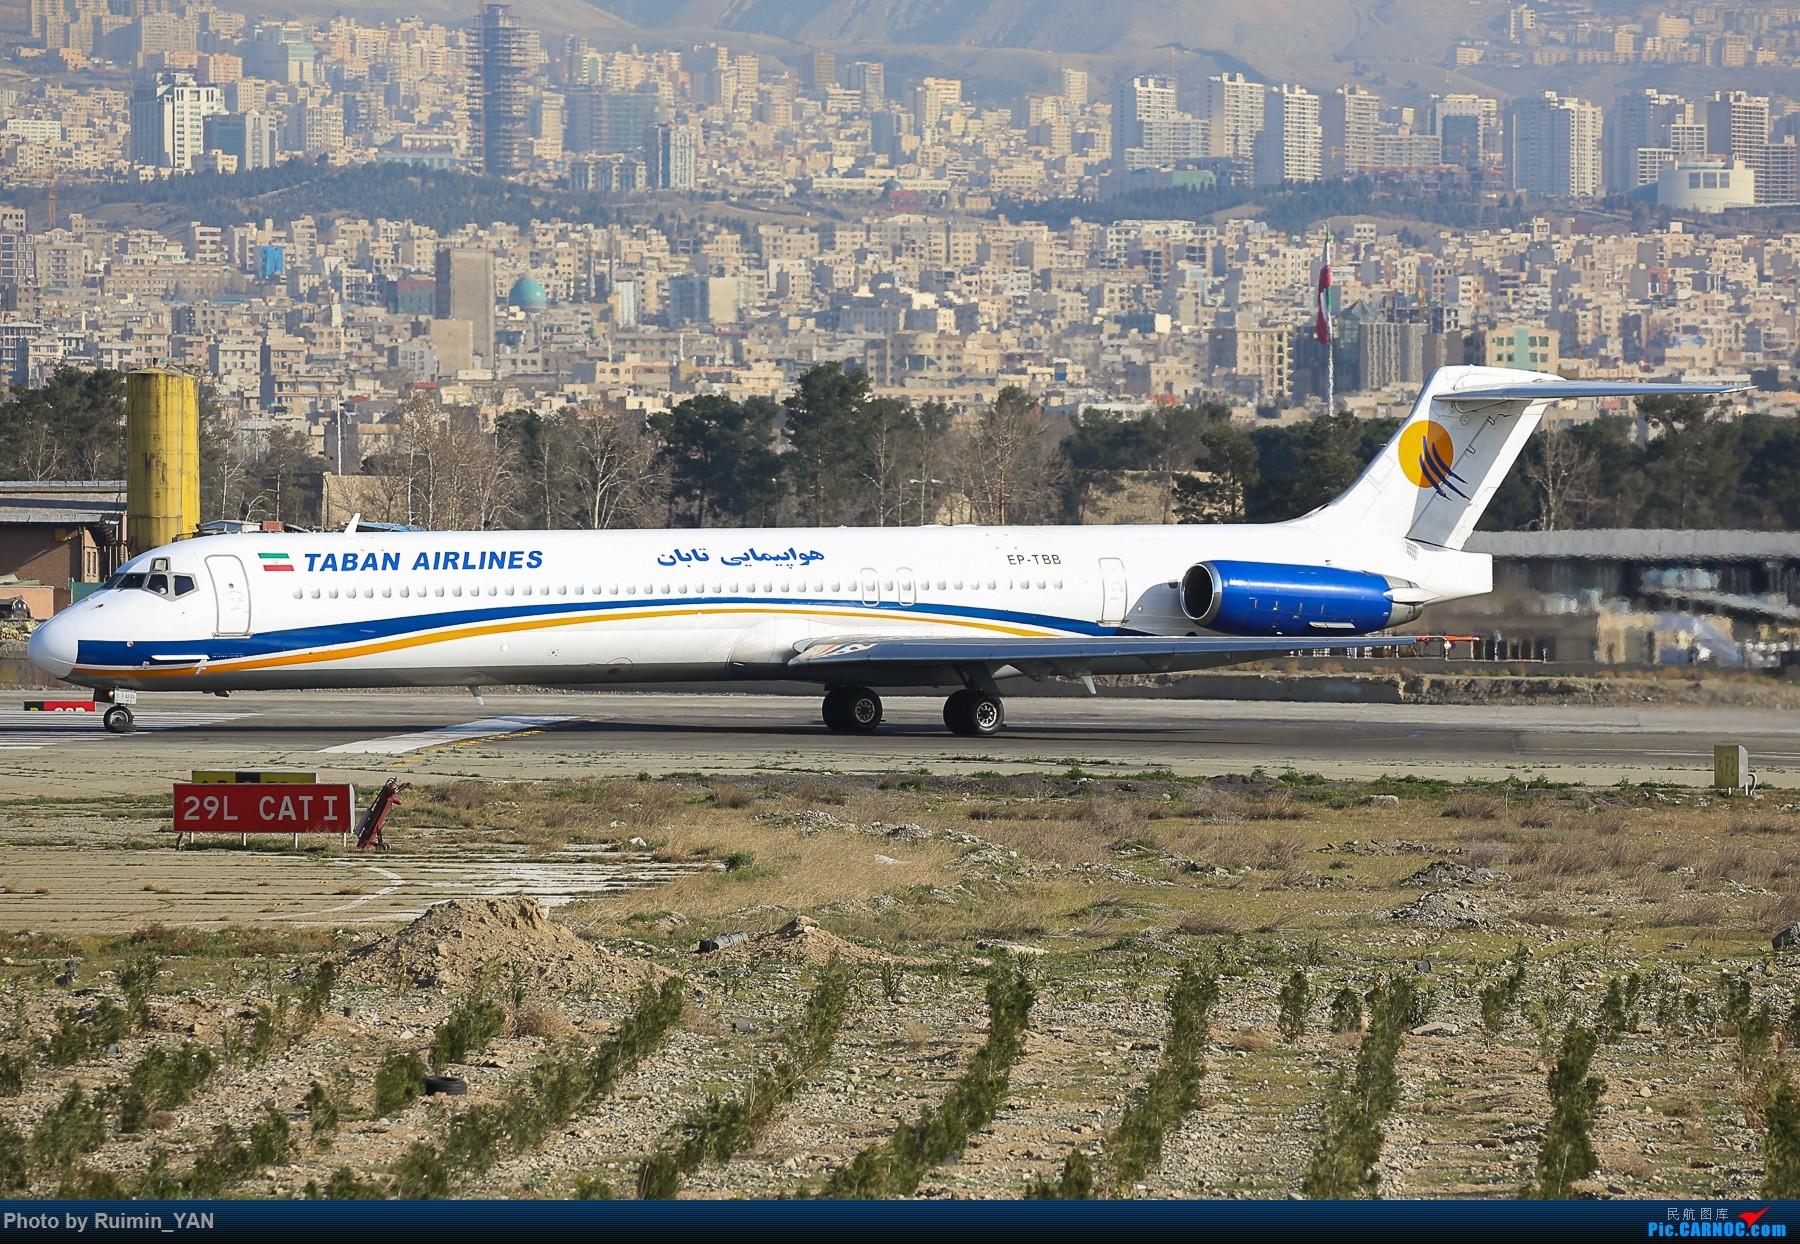 Re:[原创]【THR】(德黑兰梅赫拉巴德机场)伊朗Taban航空(Taban Airlines,HH)--MD88 MD MD-80-88 EP-TBB 伊朗德黑兰机场